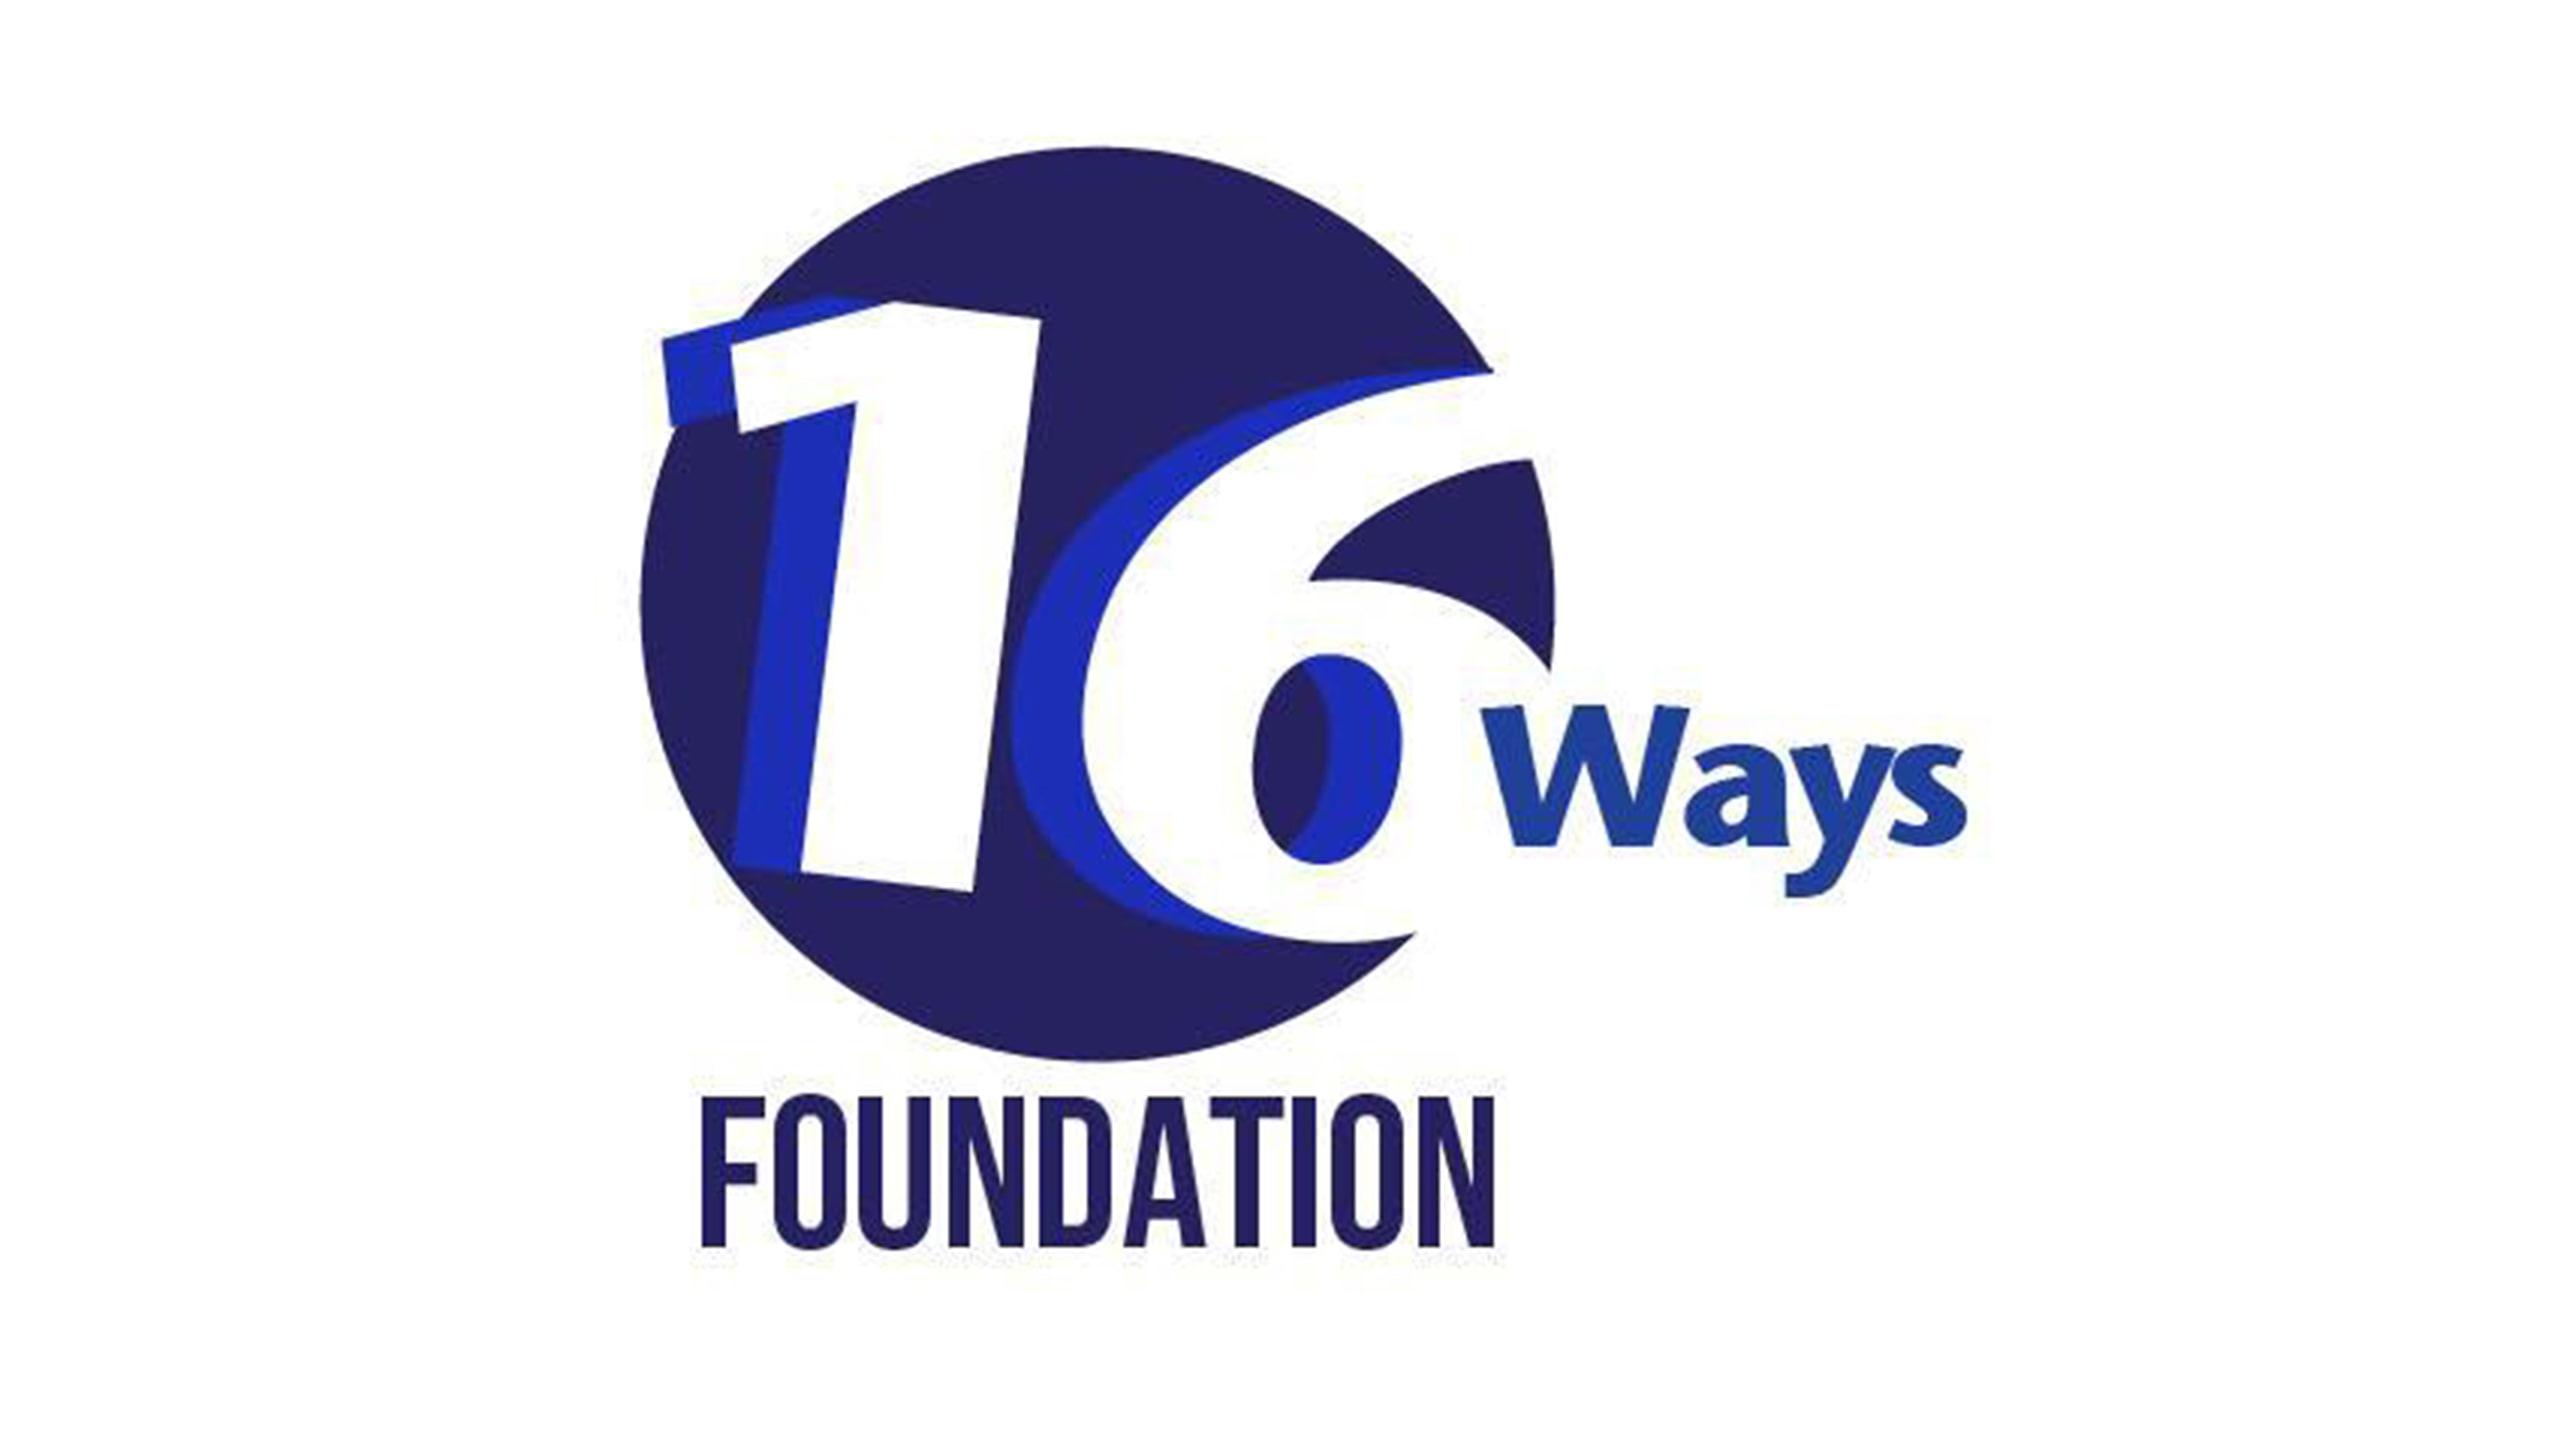 Wesley Woodyard - 16WAYS Foundation